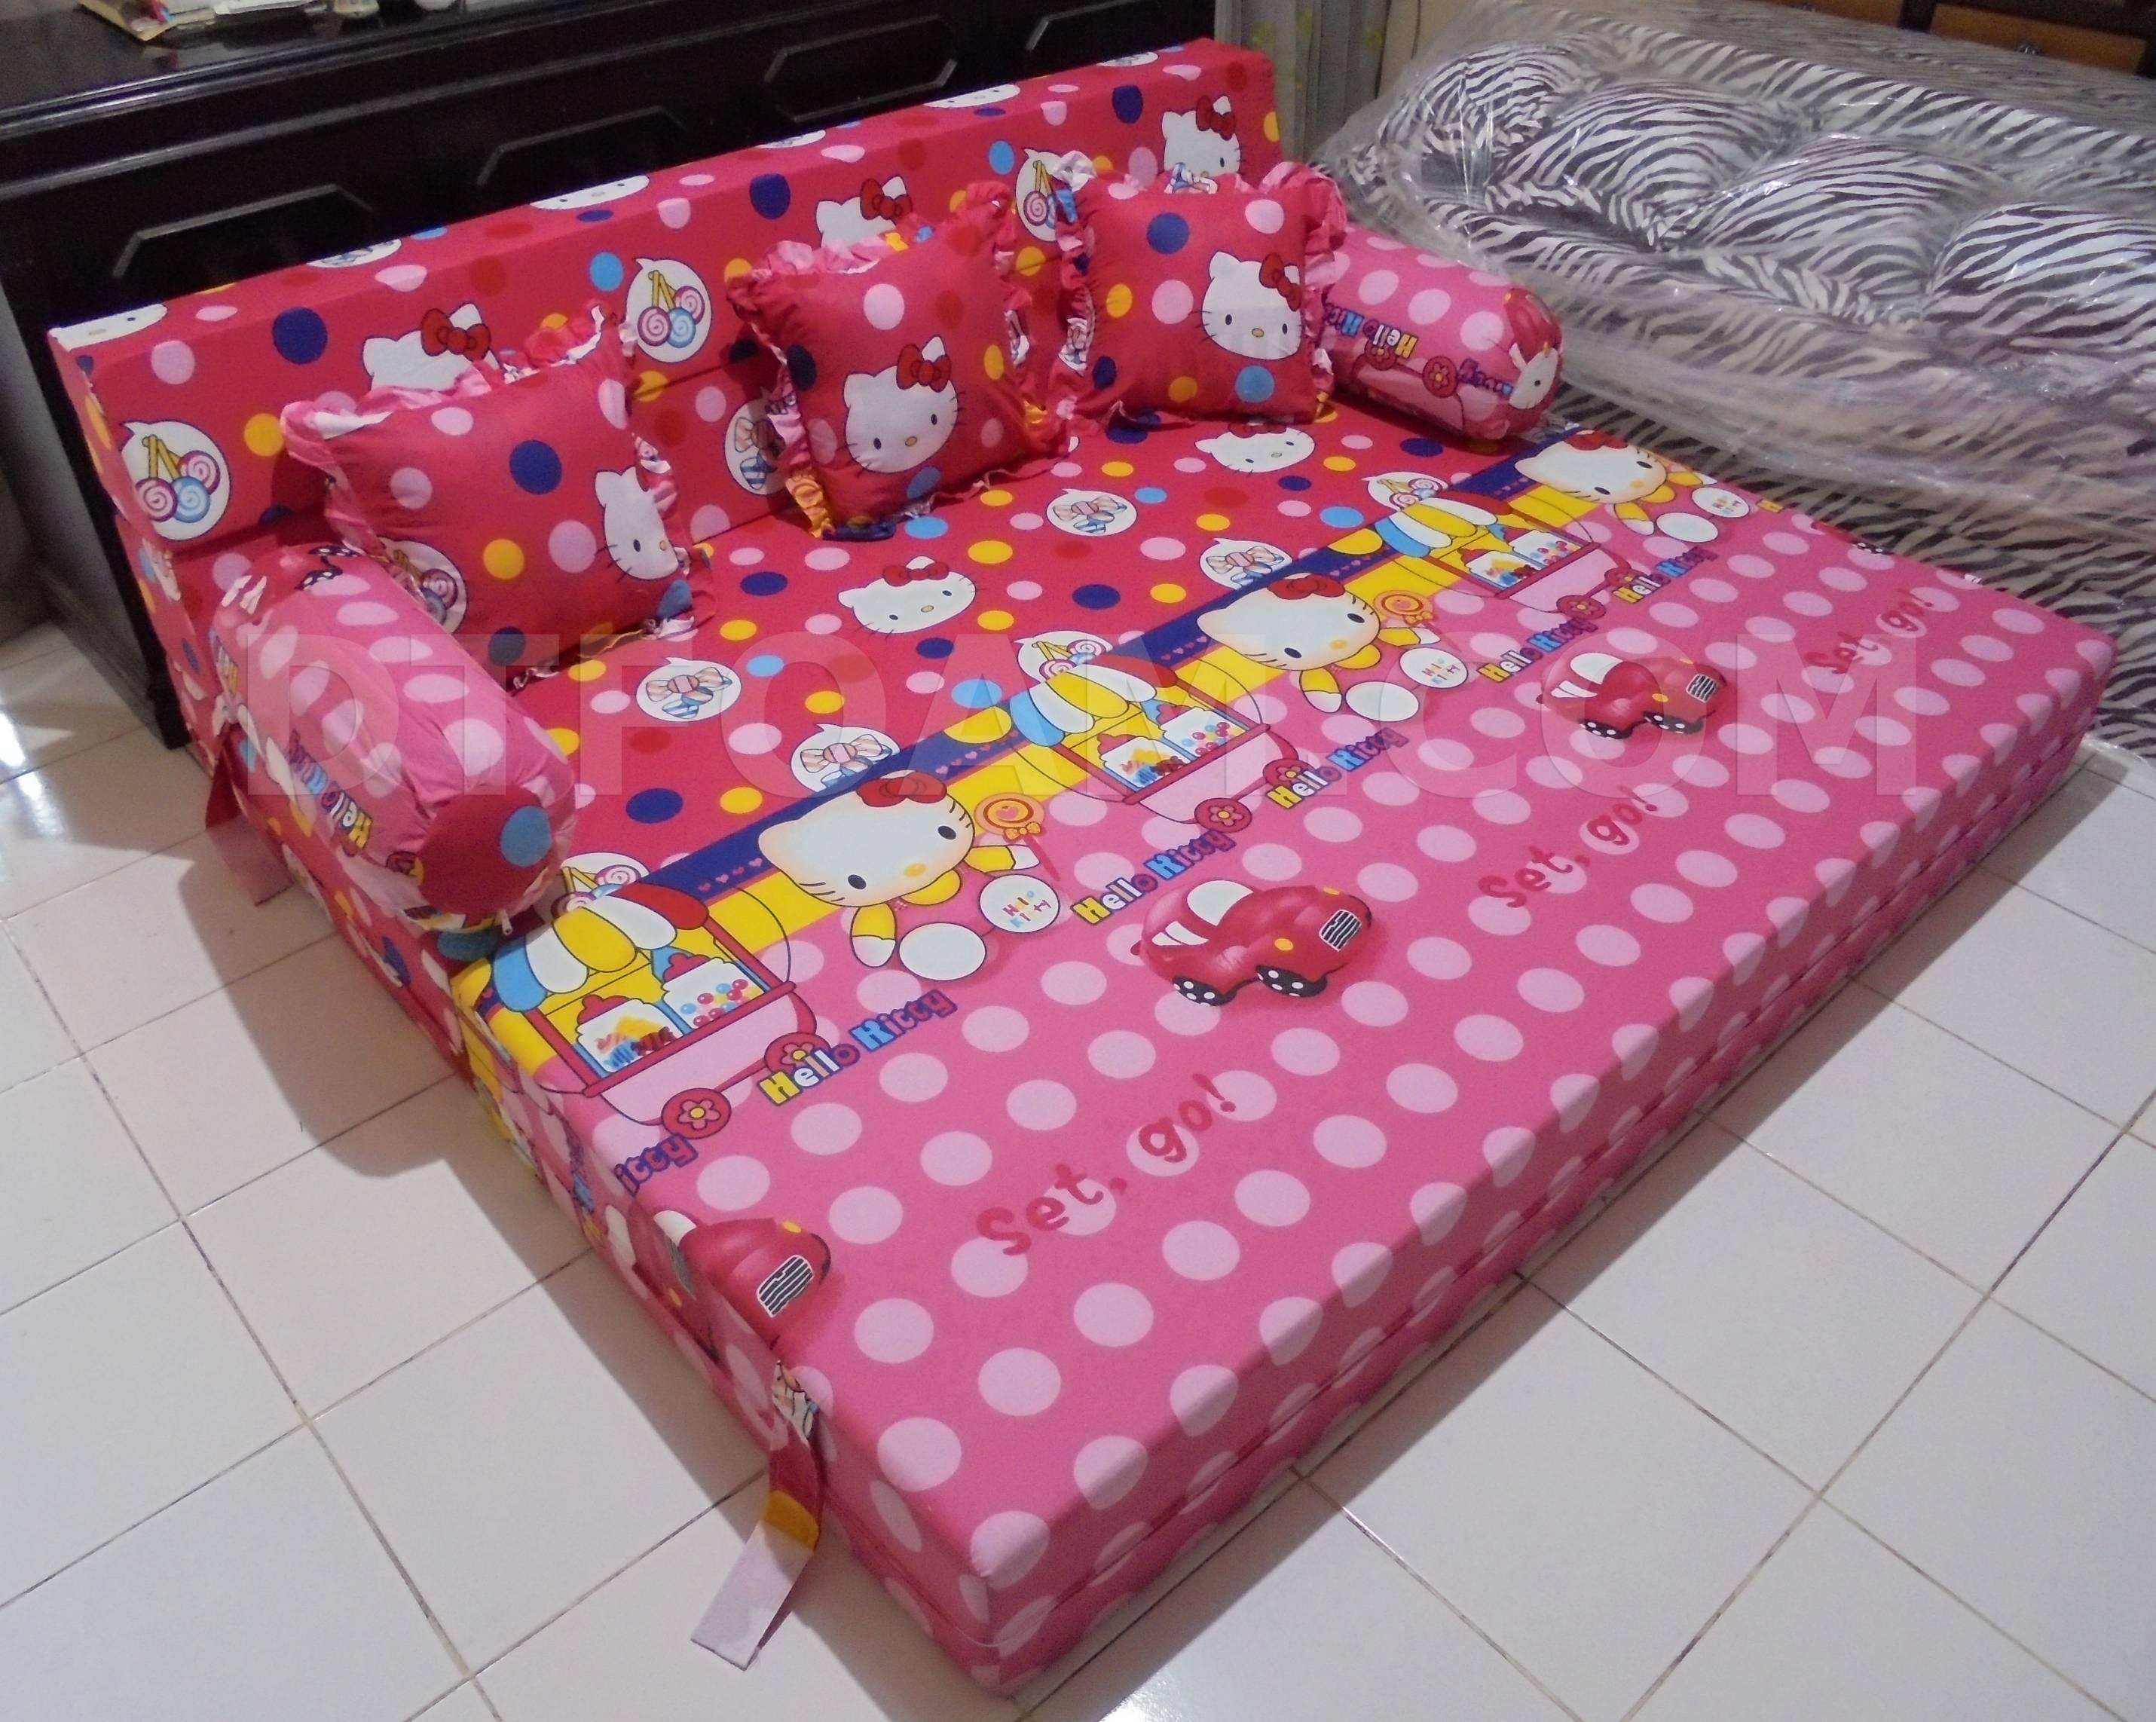 harga cover sofa bed inoac protect cat scratcher hello kitty pink biru buble 3 dtfoam com